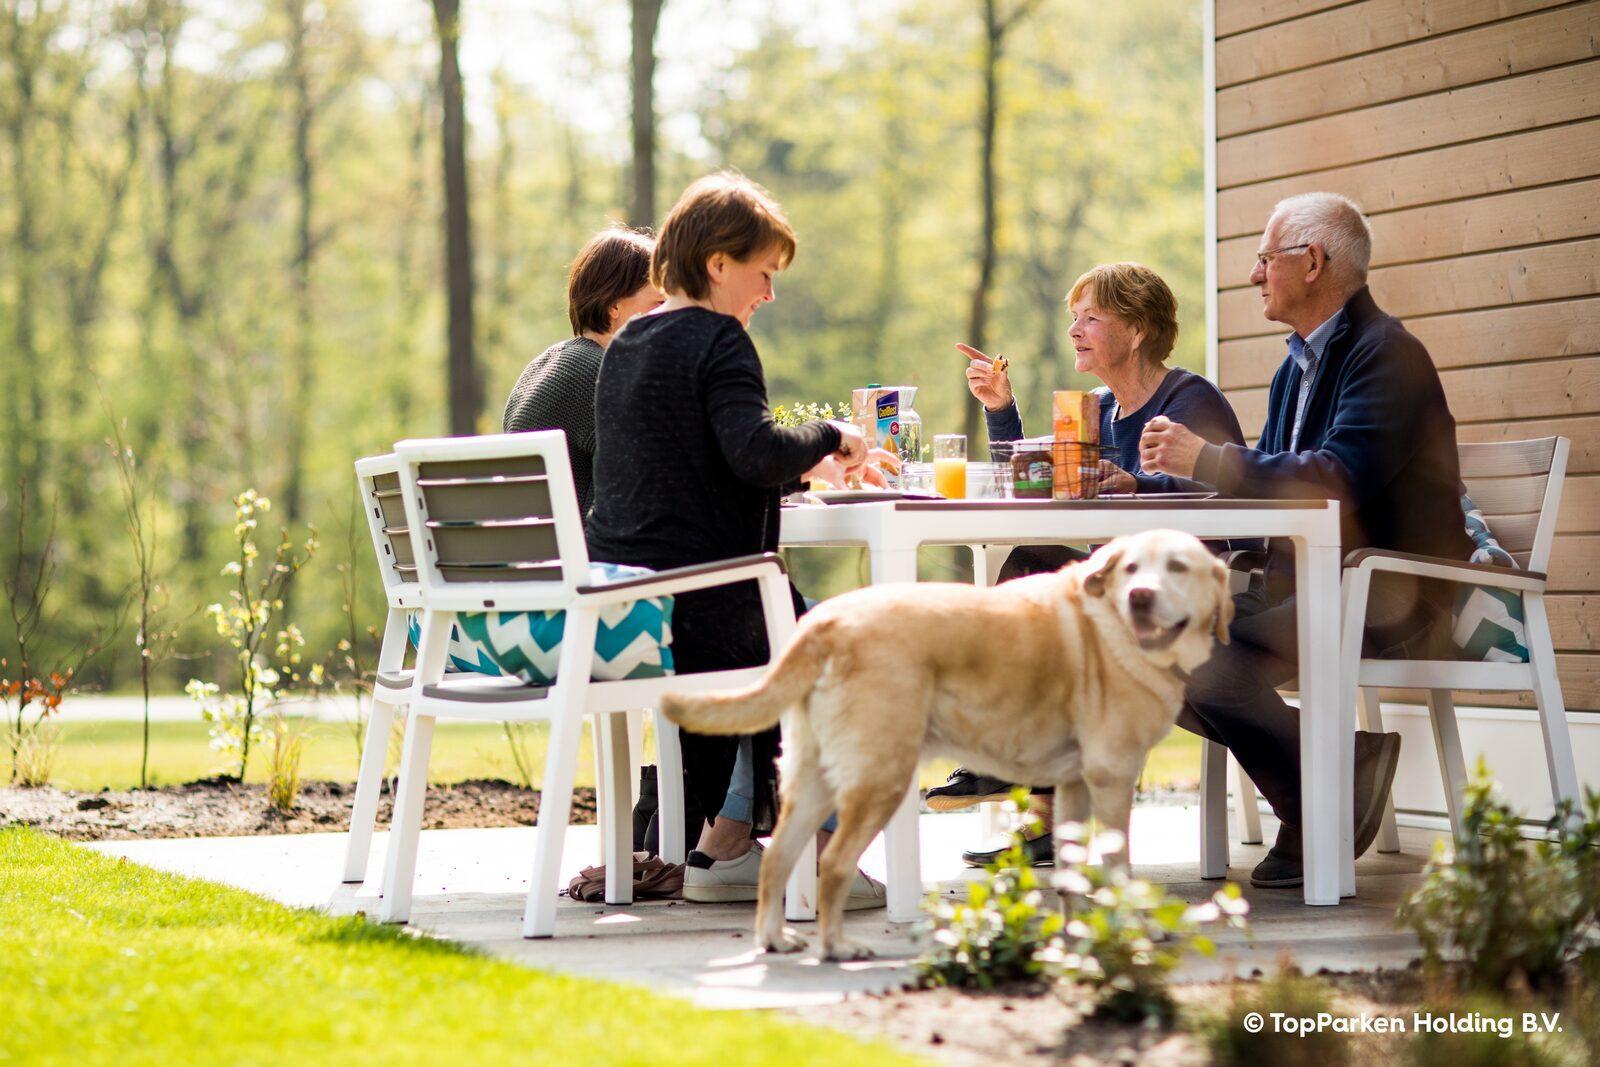 TopParken - Holiday parks in NL - True enjoyment, from head